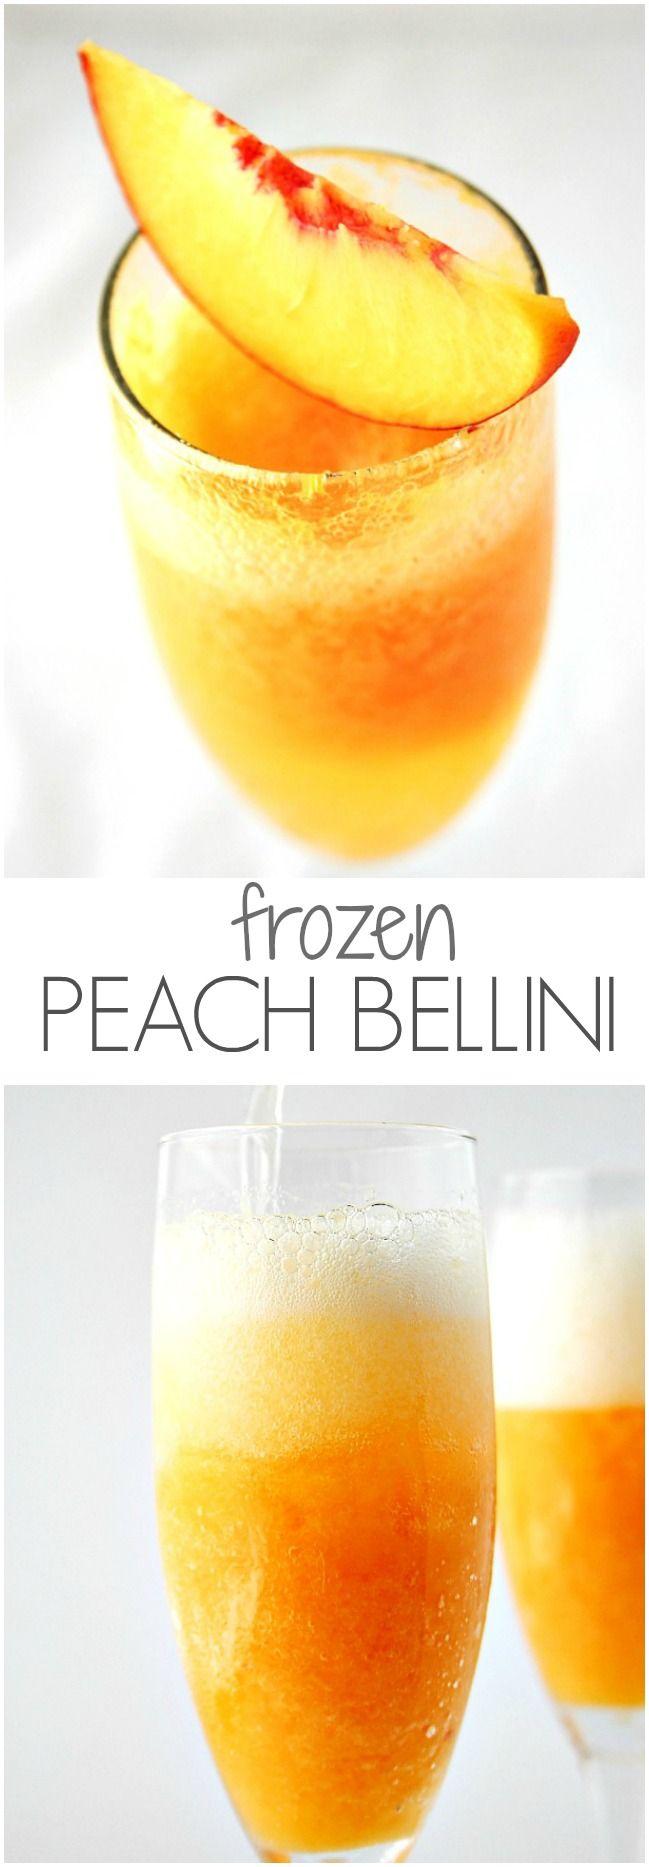 Frozen Peach Bellini - jazz up sparkling wine or champagne with frozen peach puree! @crunchycreamysw